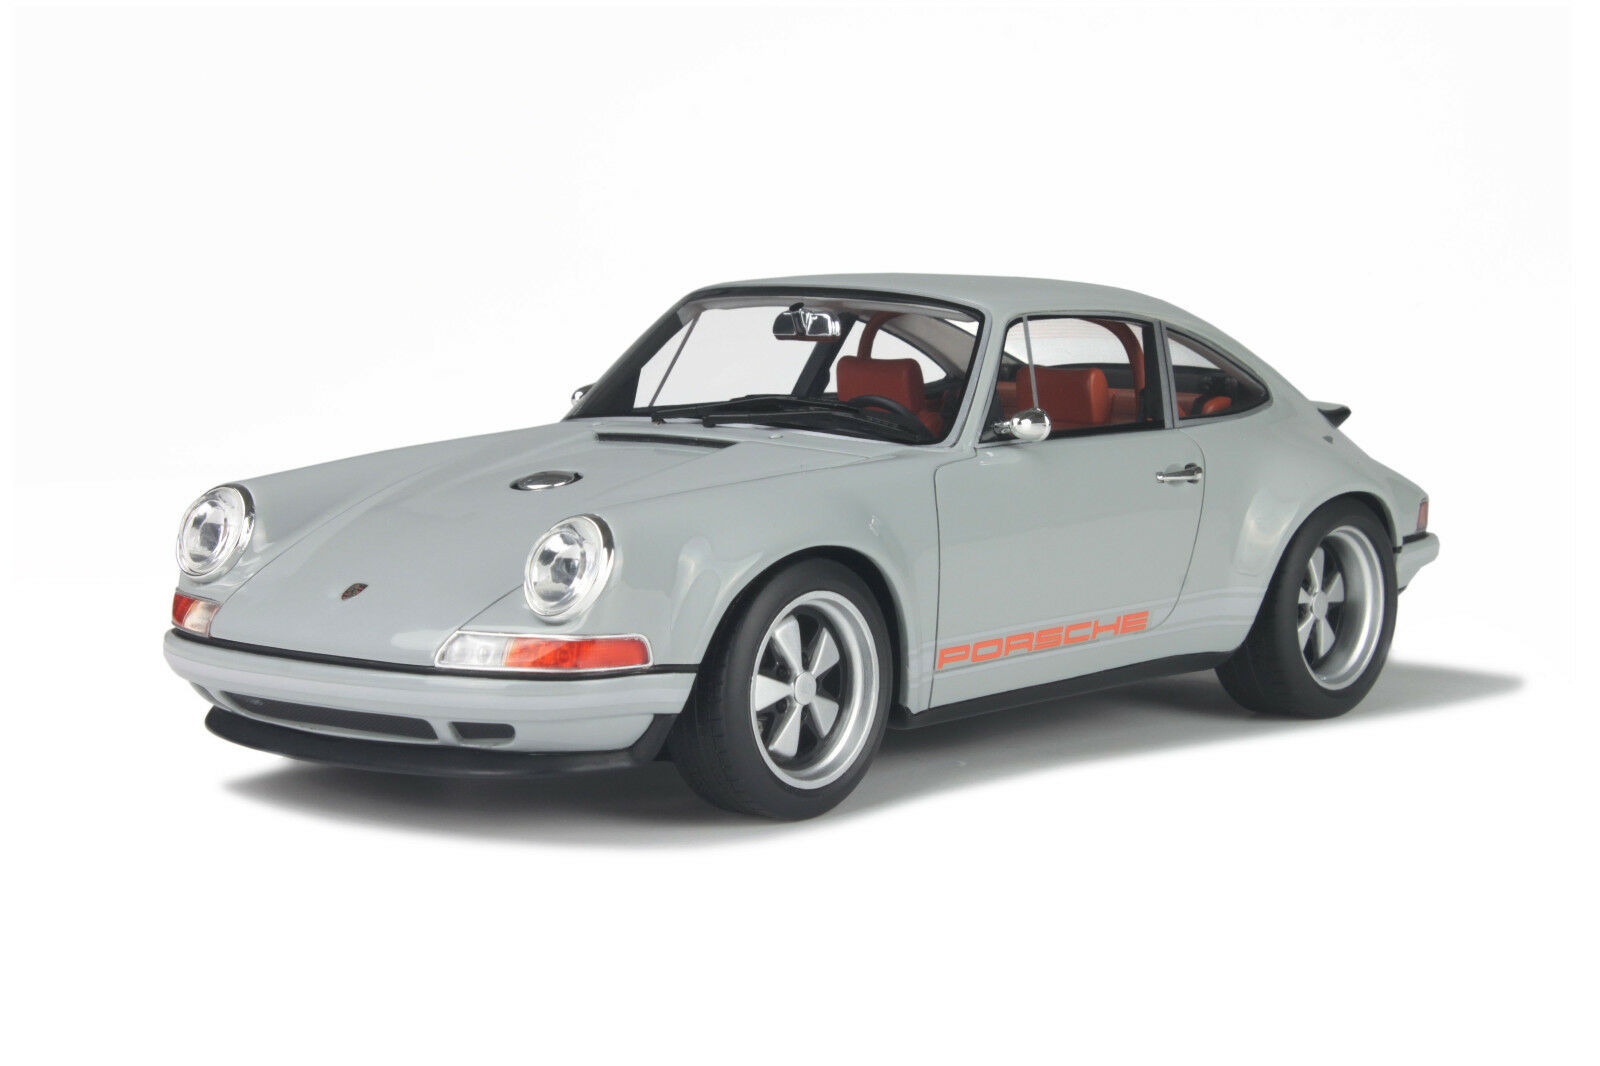 1:18 GT Spirit cantante Porsche  Gris Limited Edition GT088 Nuevo Envío Gratis